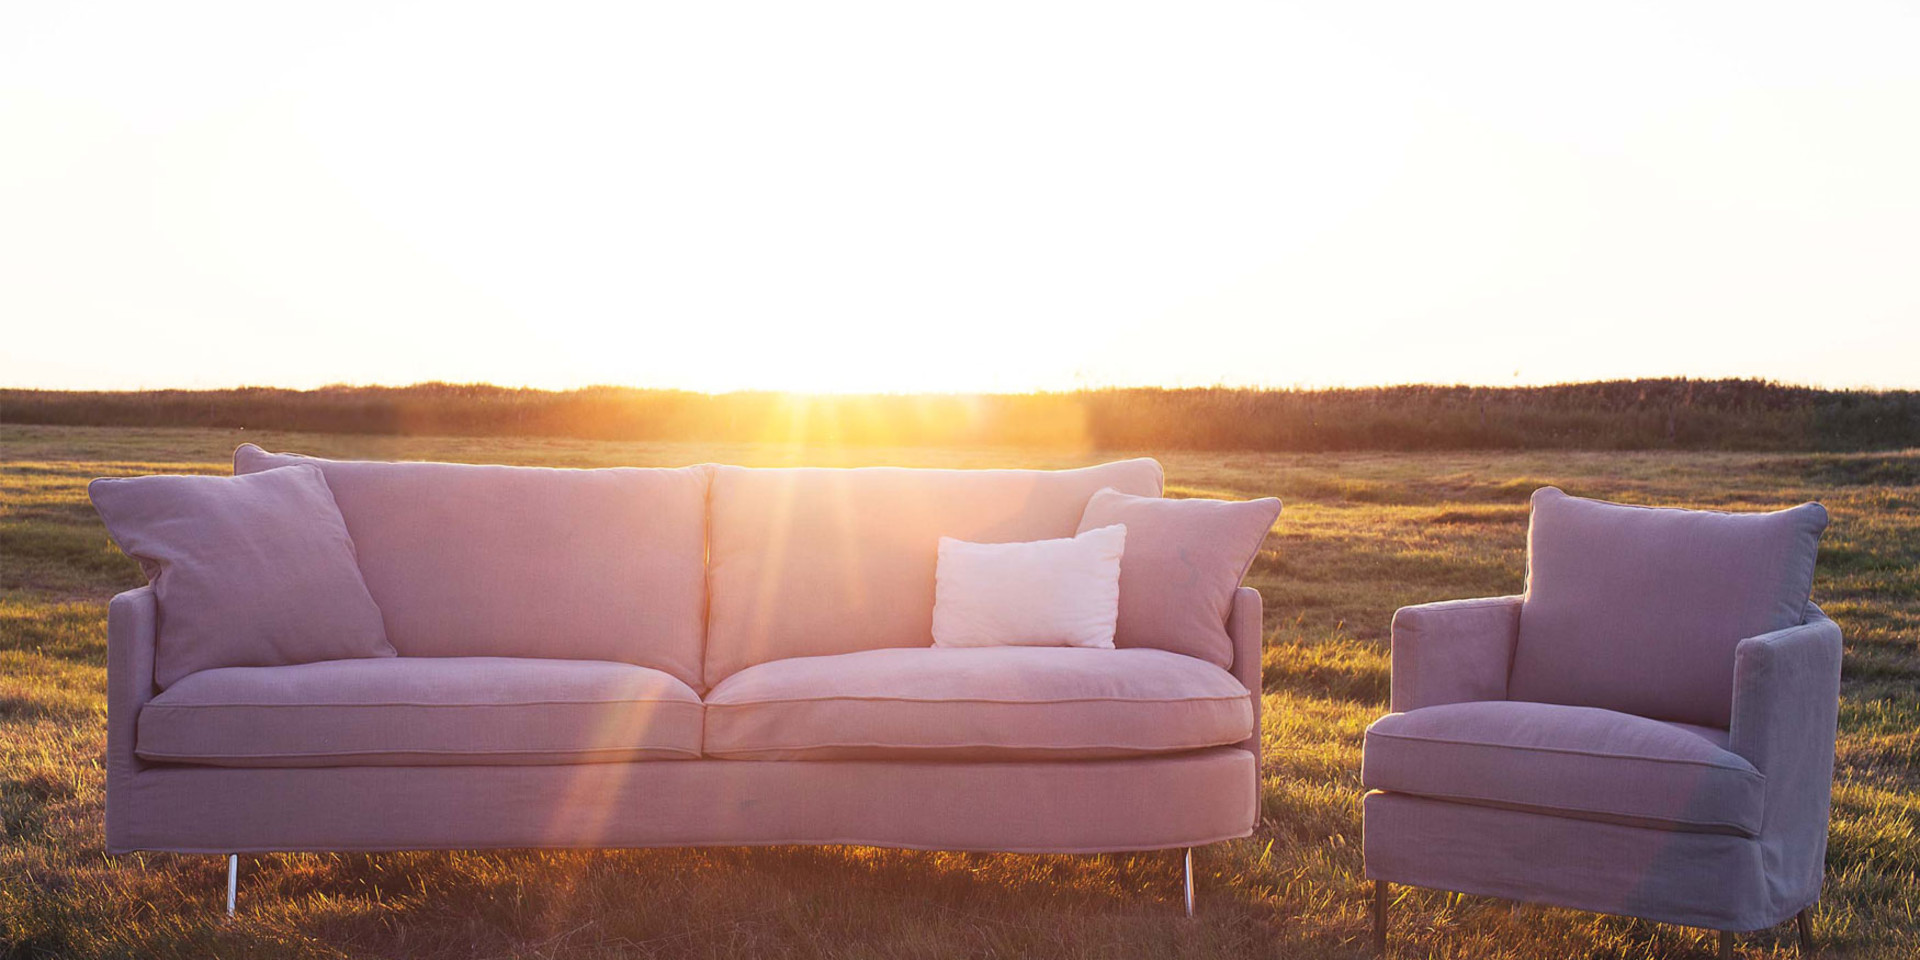 sits-julia-ambiance-arrangement_set1_armchair_caleido3790_light_beige_3_0